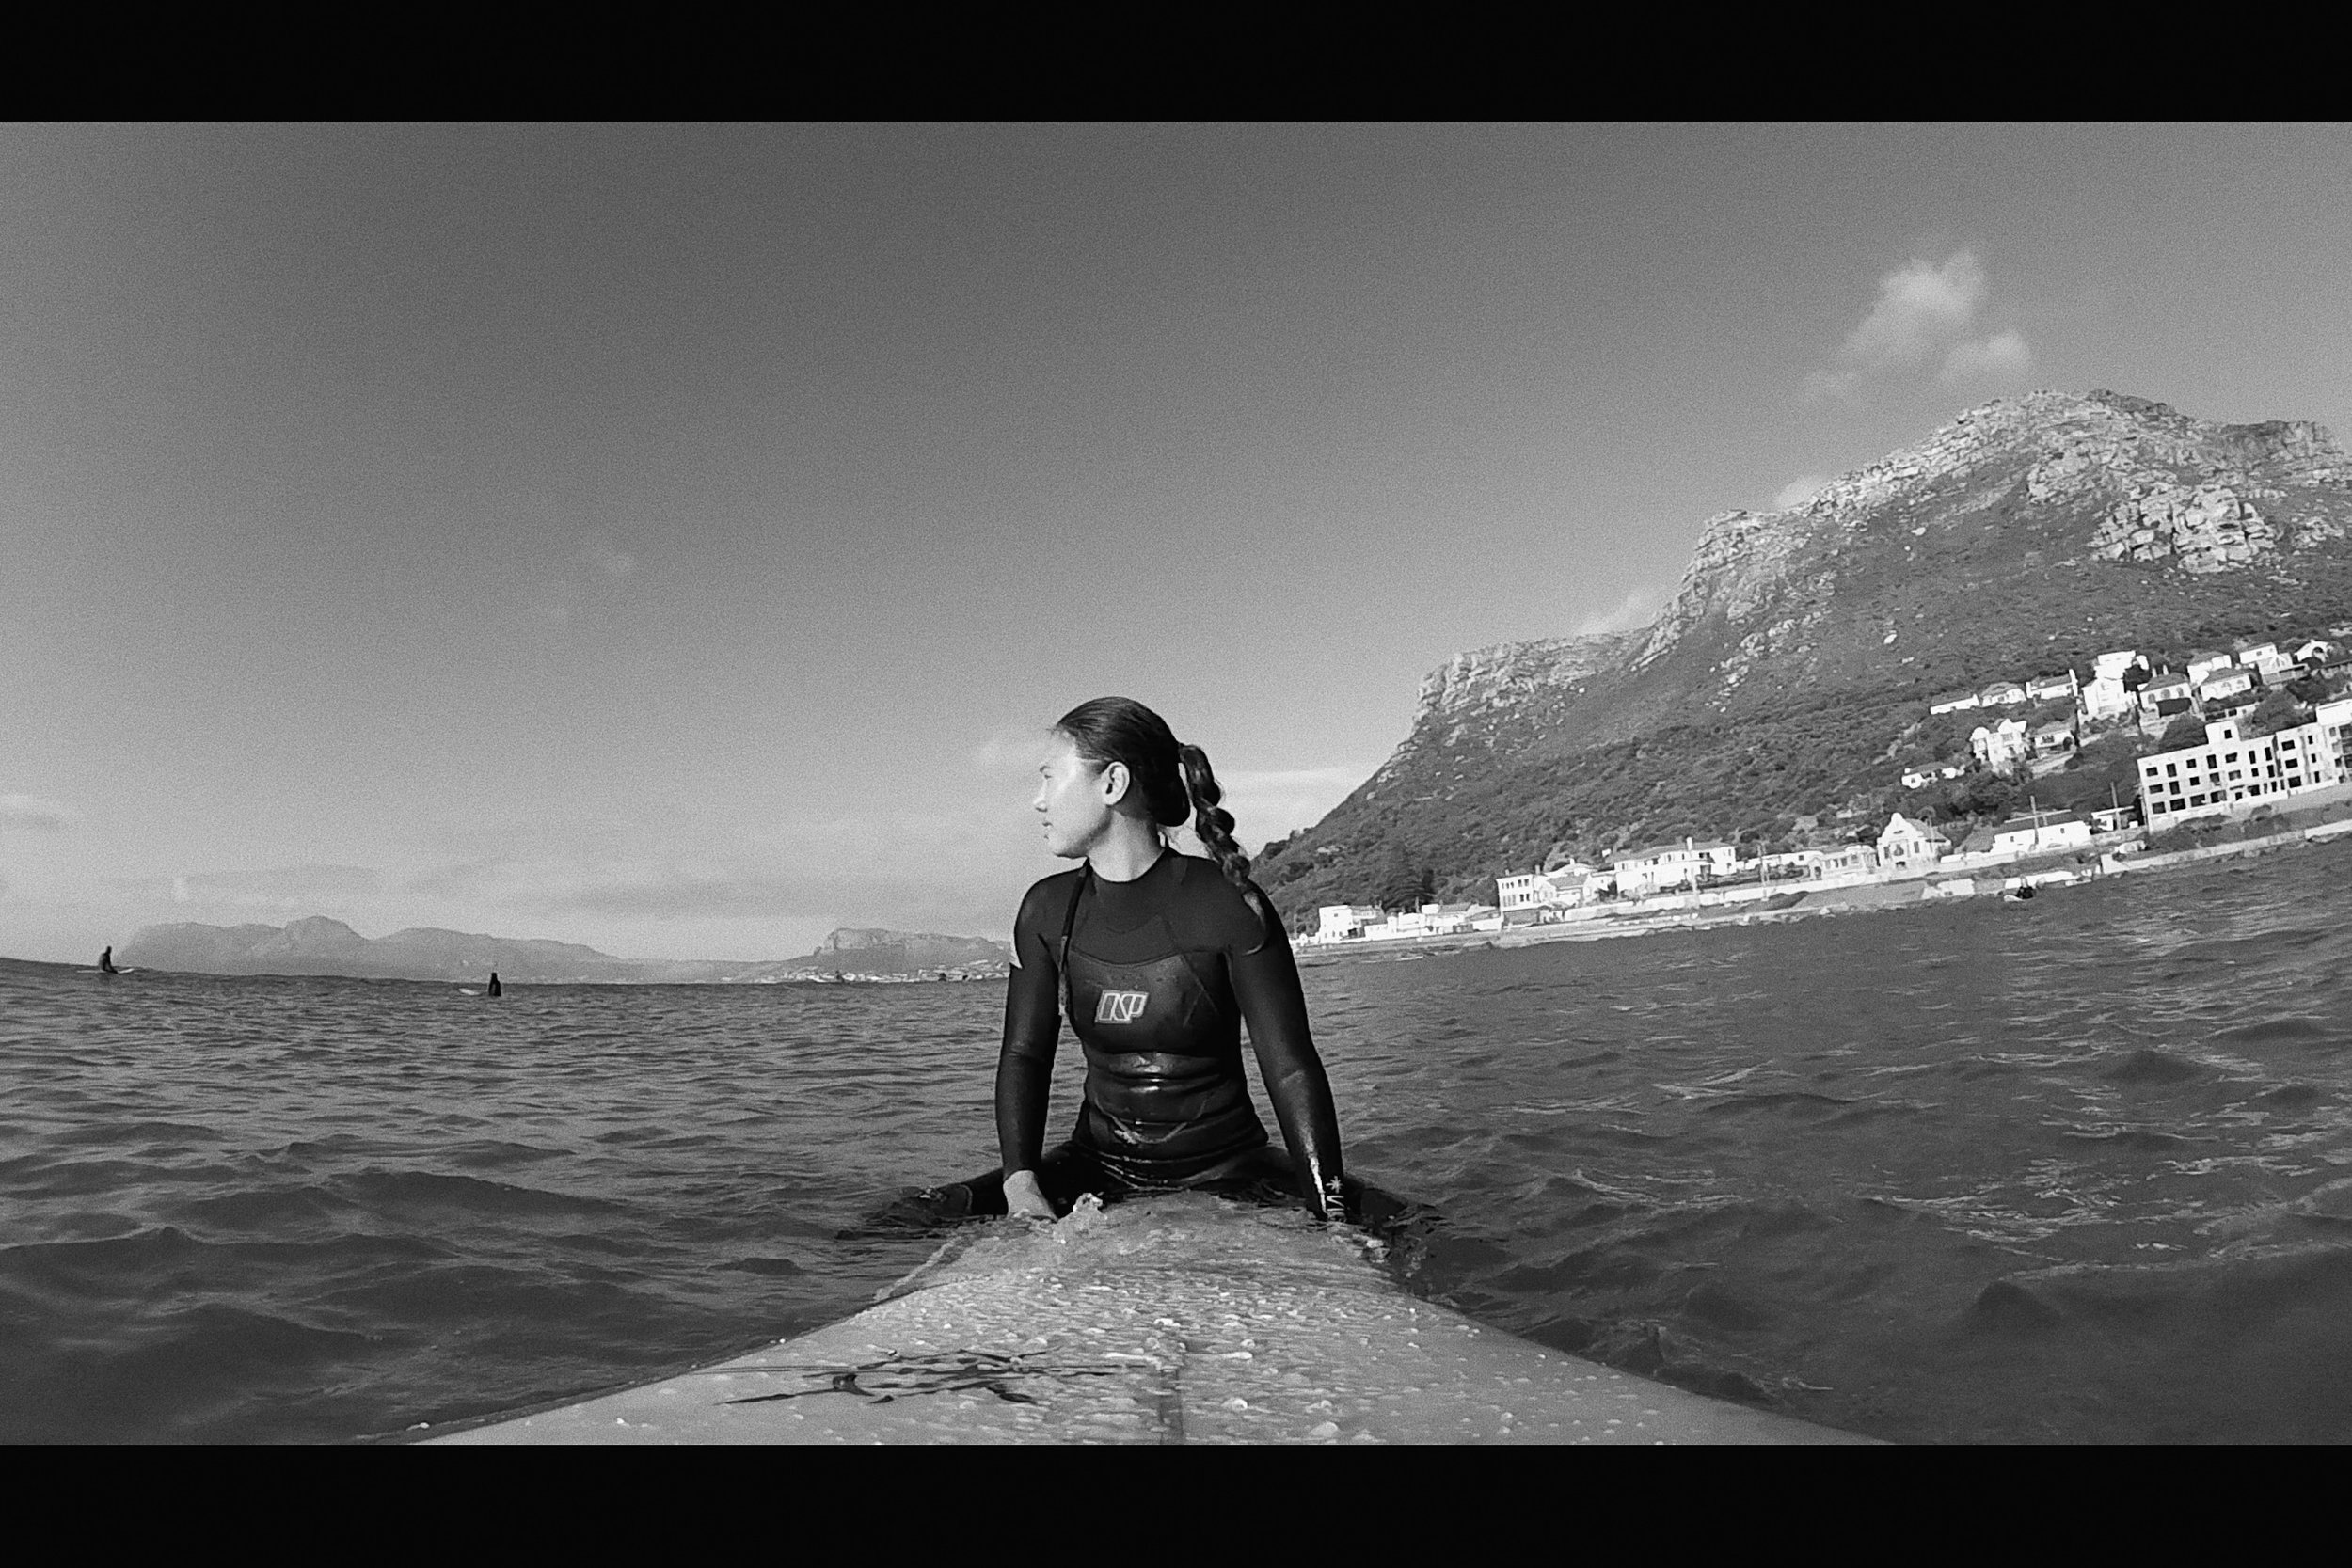 Rebecca surfing